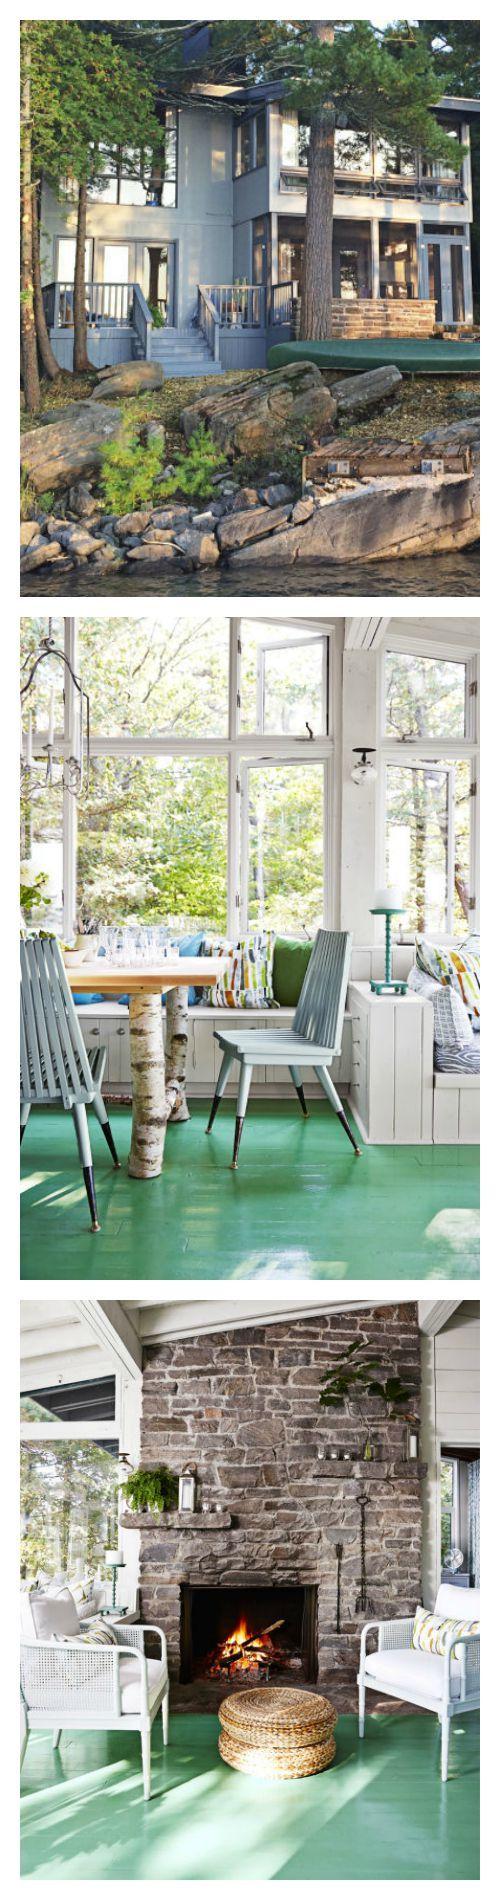 Best 25+ Lake house interiors ideas on Pinterest   Lake house ...